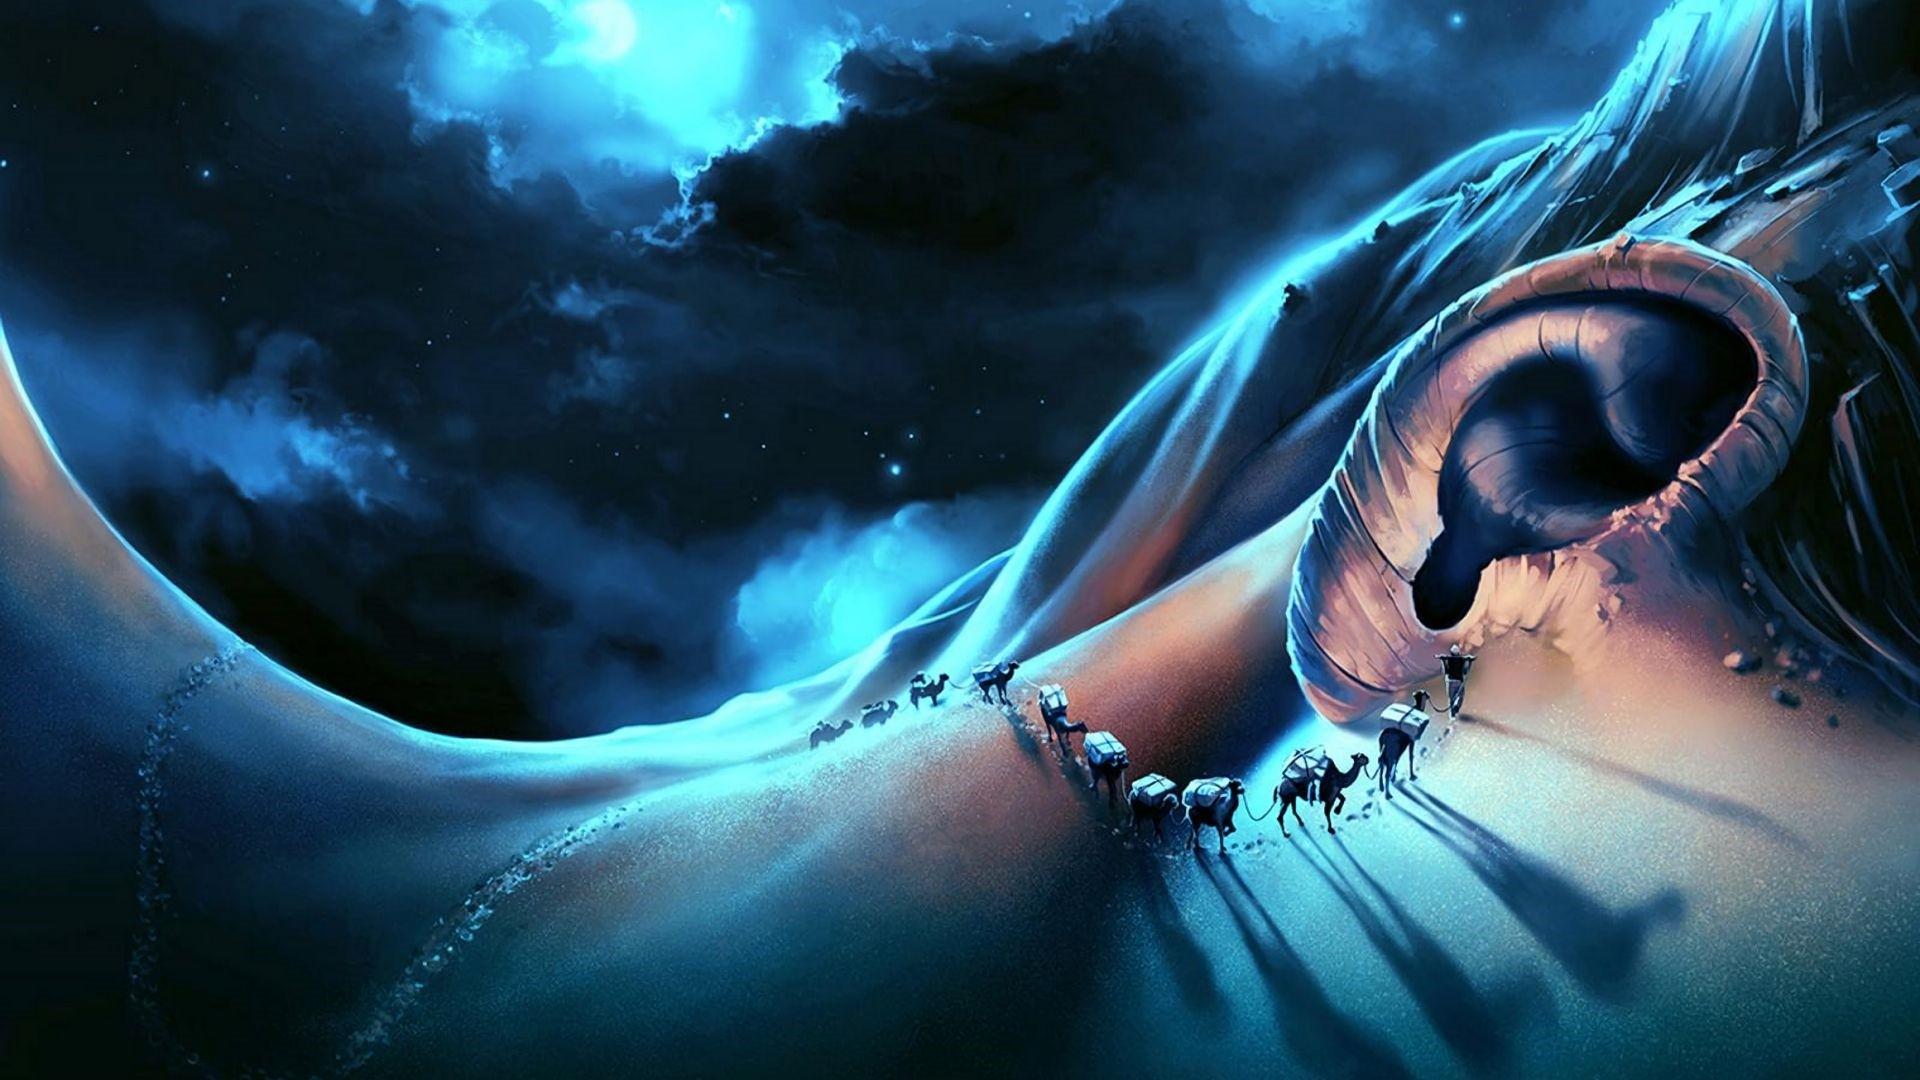 Surrealism Art Wallpaper theme